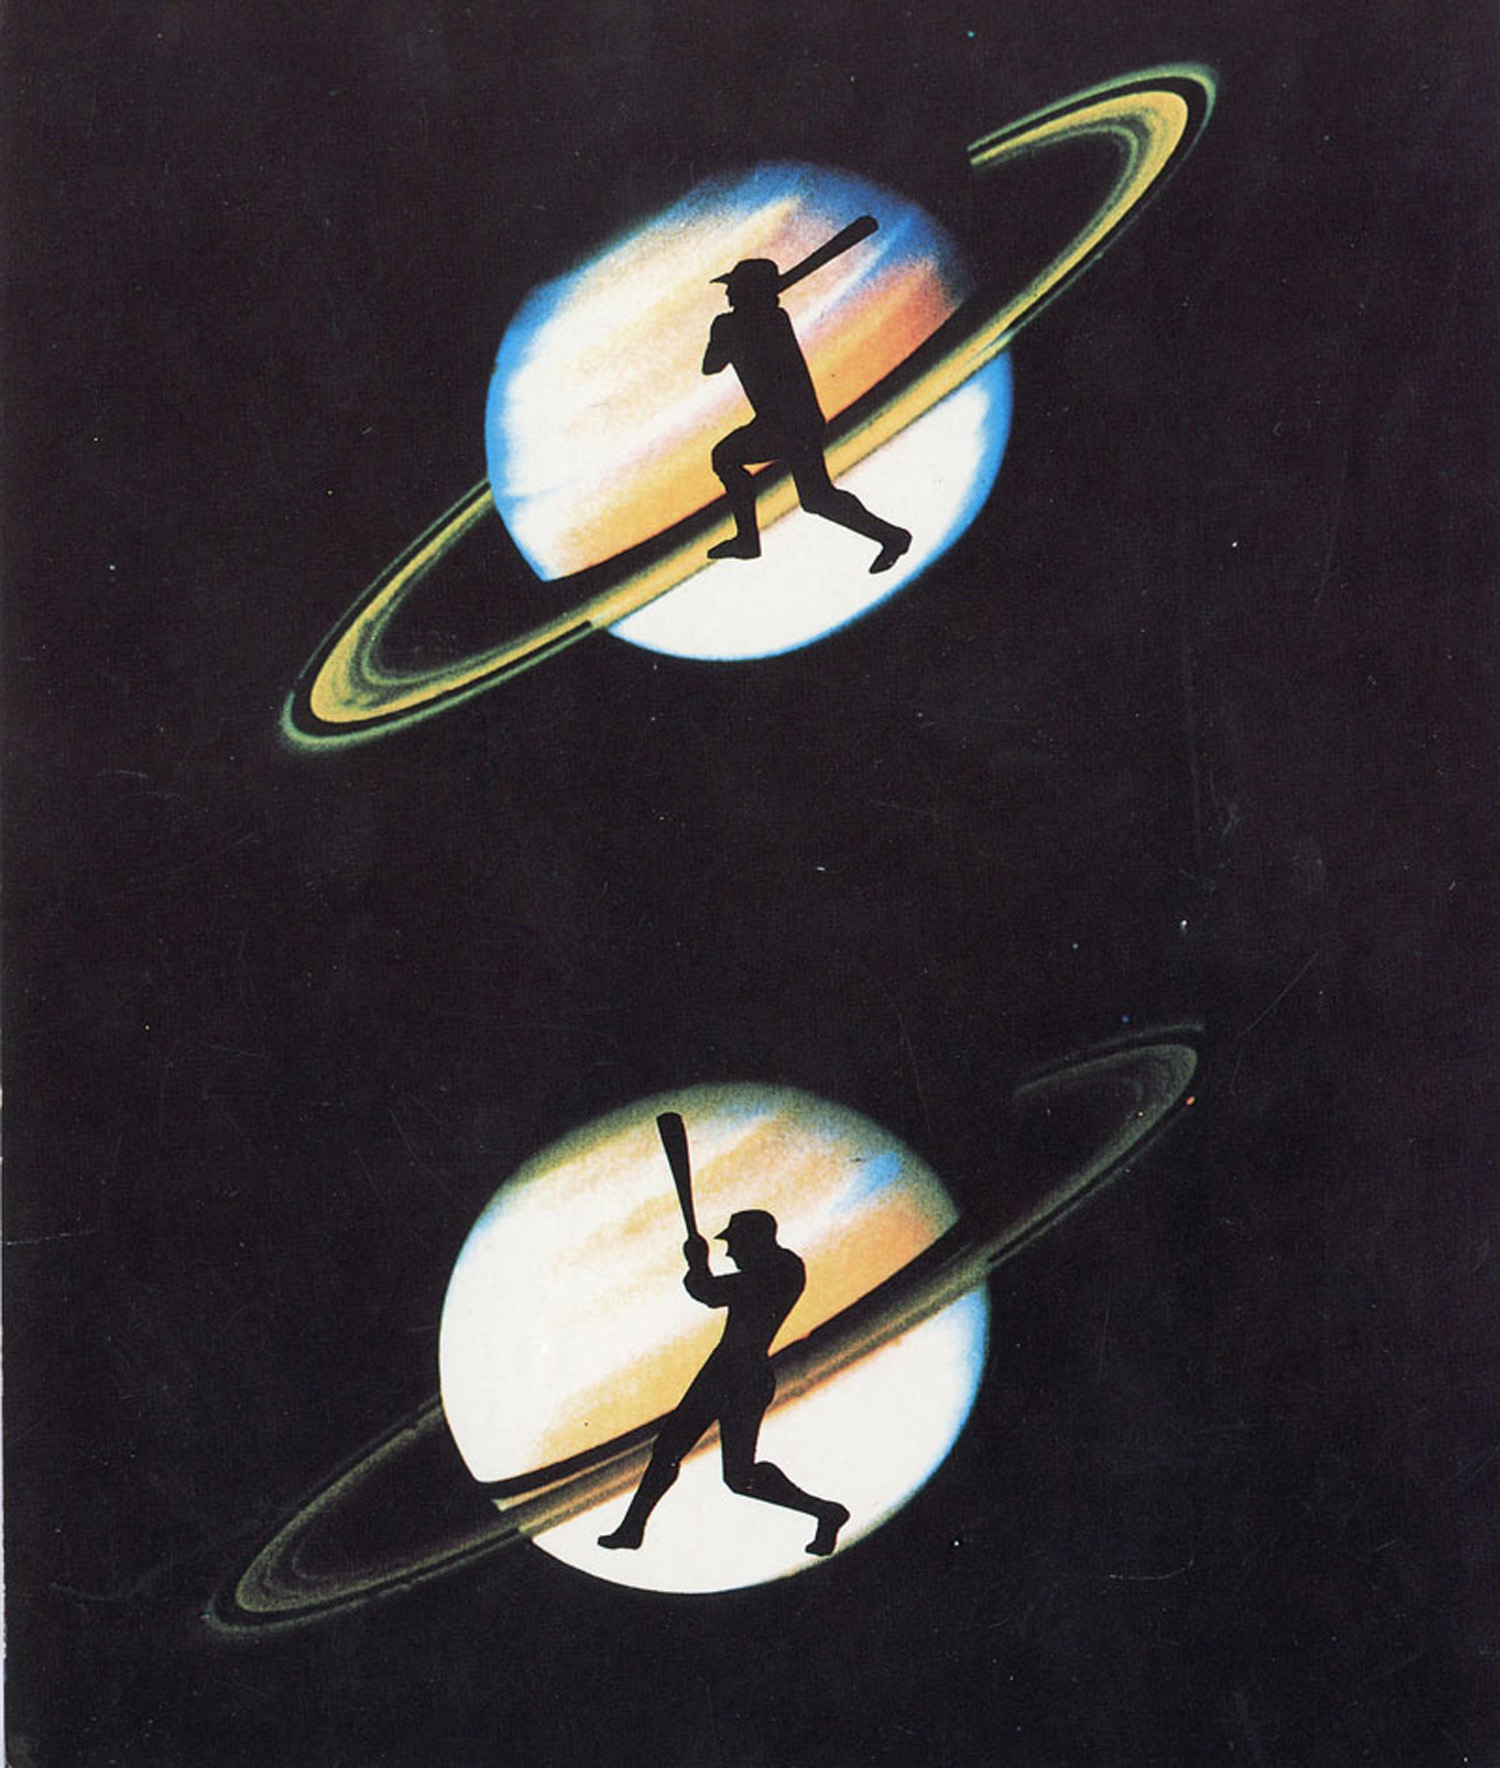 Lieberman & Saul Gallery, Eve Sonneman, Polaroid Sonnegrams, Announcement Card, 1989.